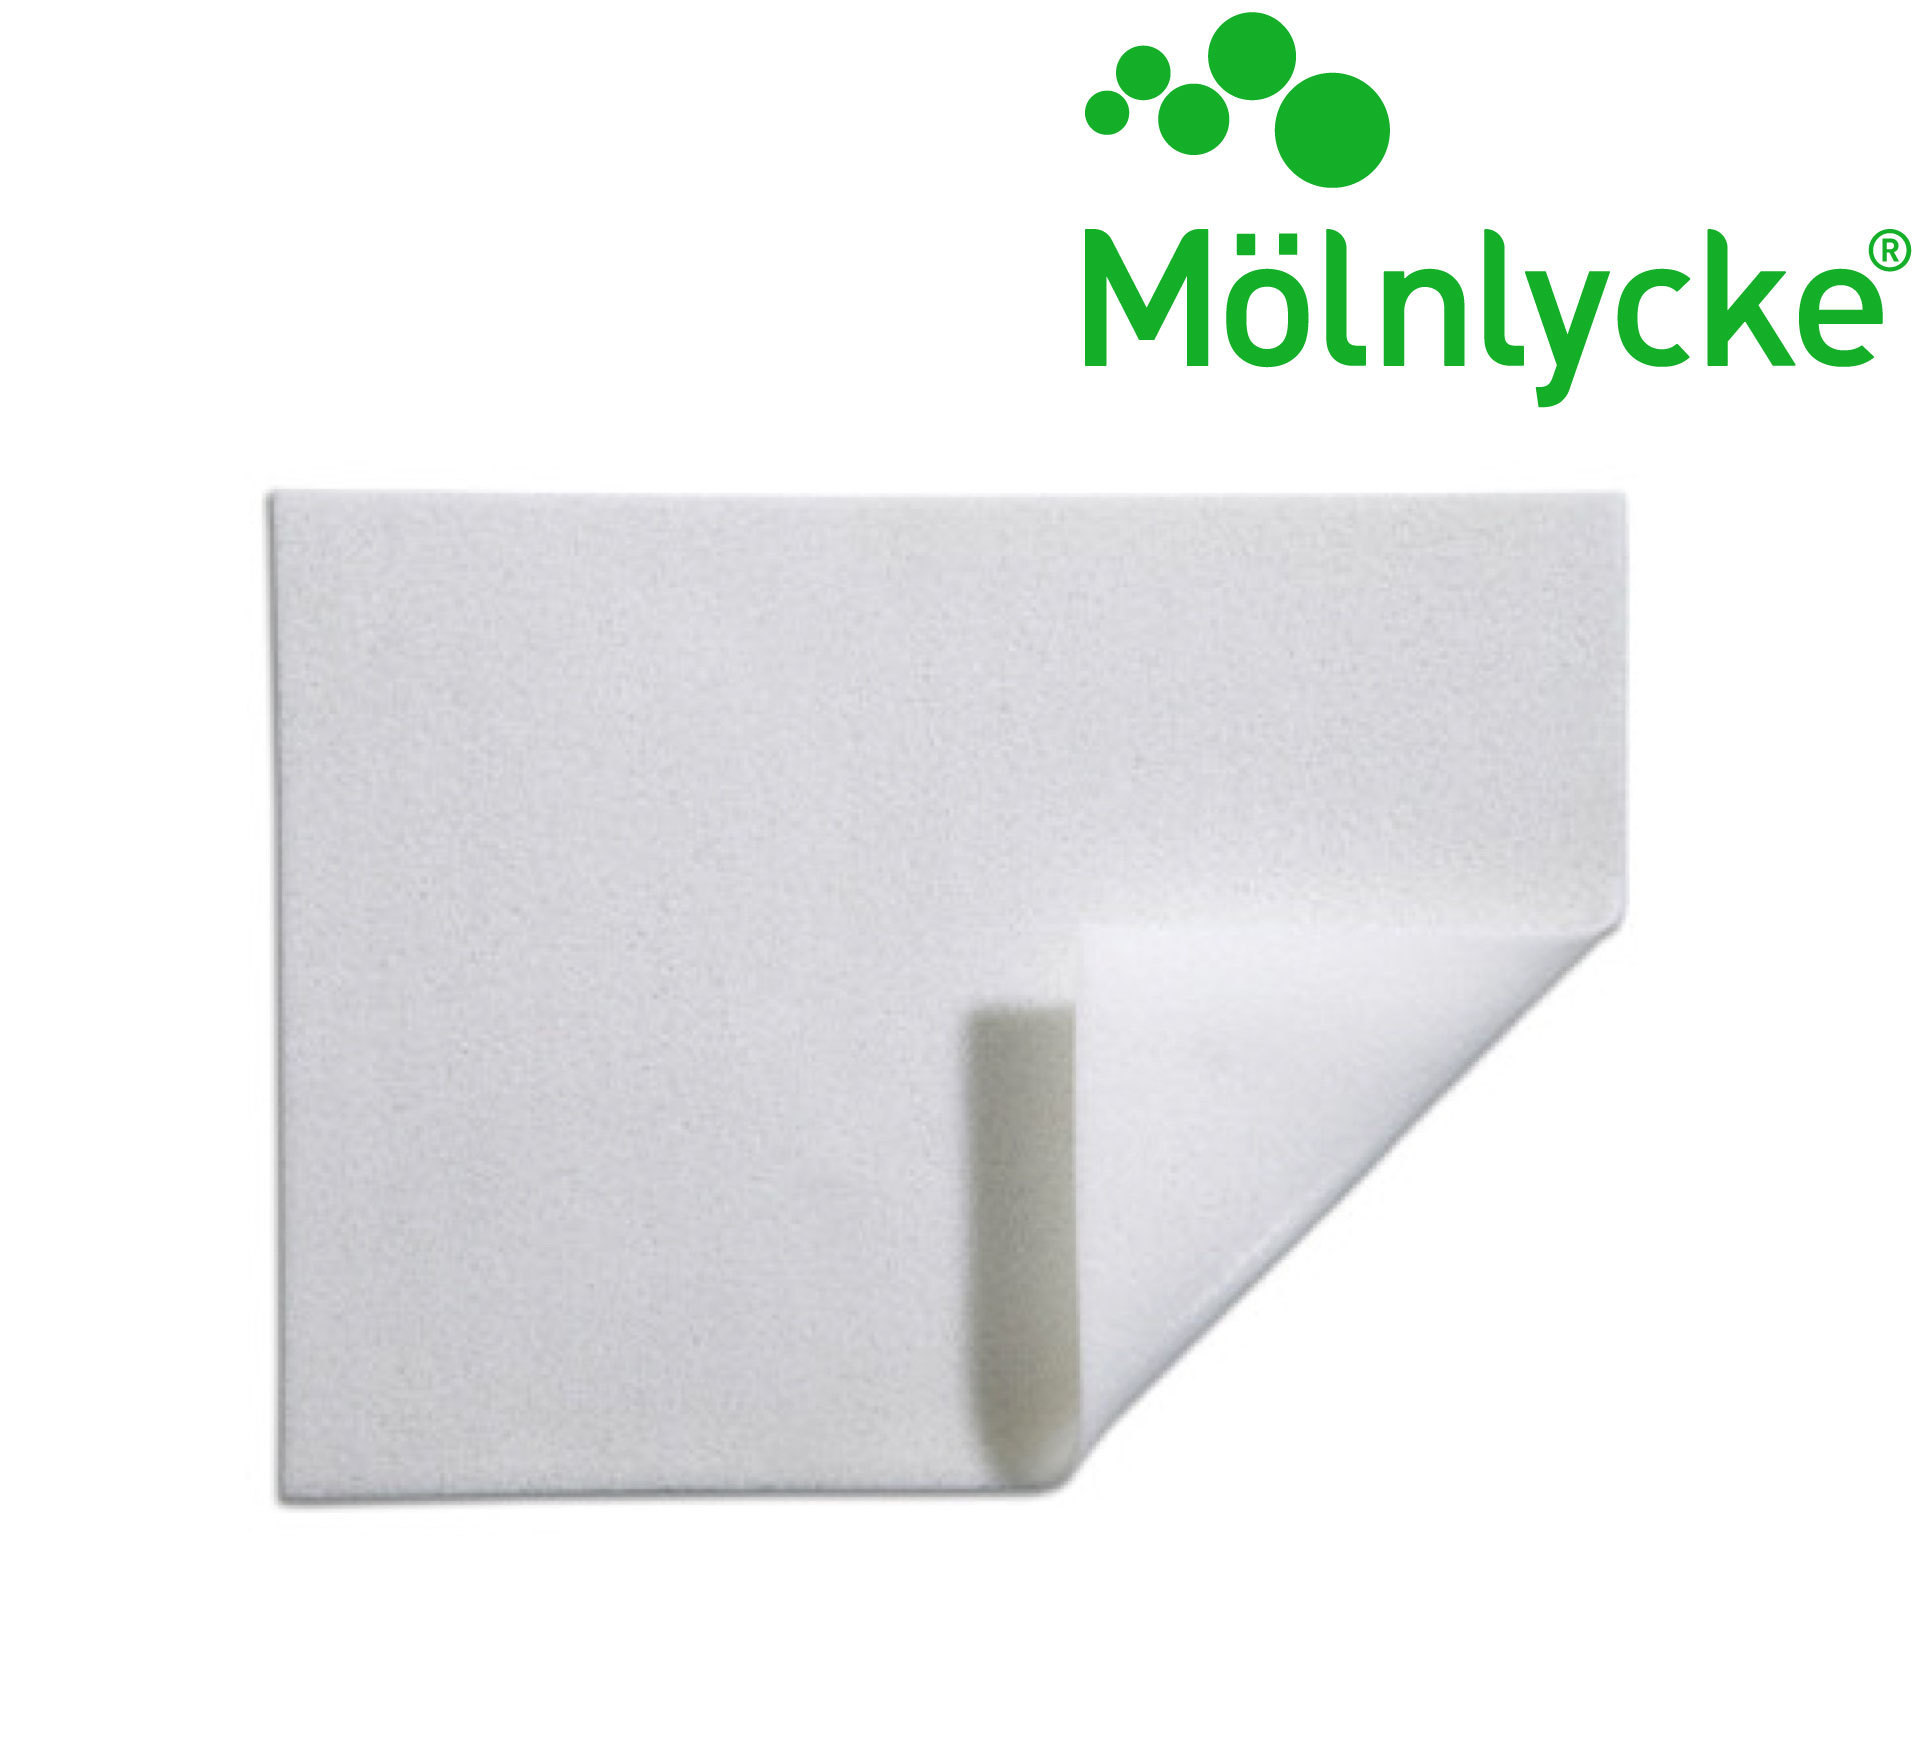 Мепилекс Трансфер (Mepilex Transfer) 20x50 см, 4 шт в упаковке